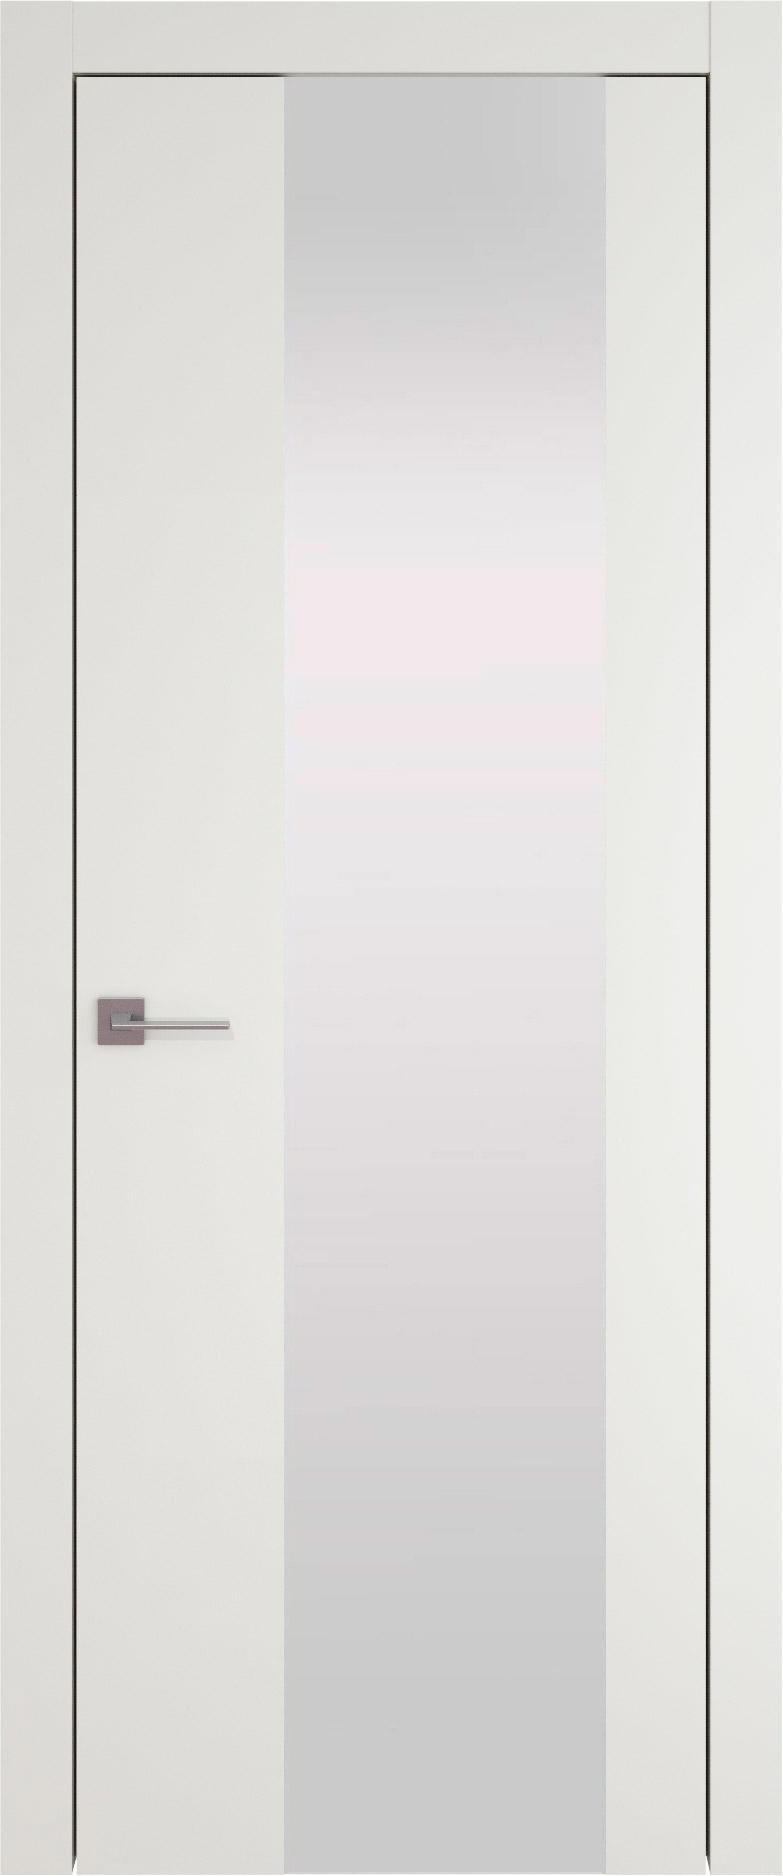 Tivoli Е-1 цвет - Бежевая эмаль (RAL 9010) Со стеклом (ДО)